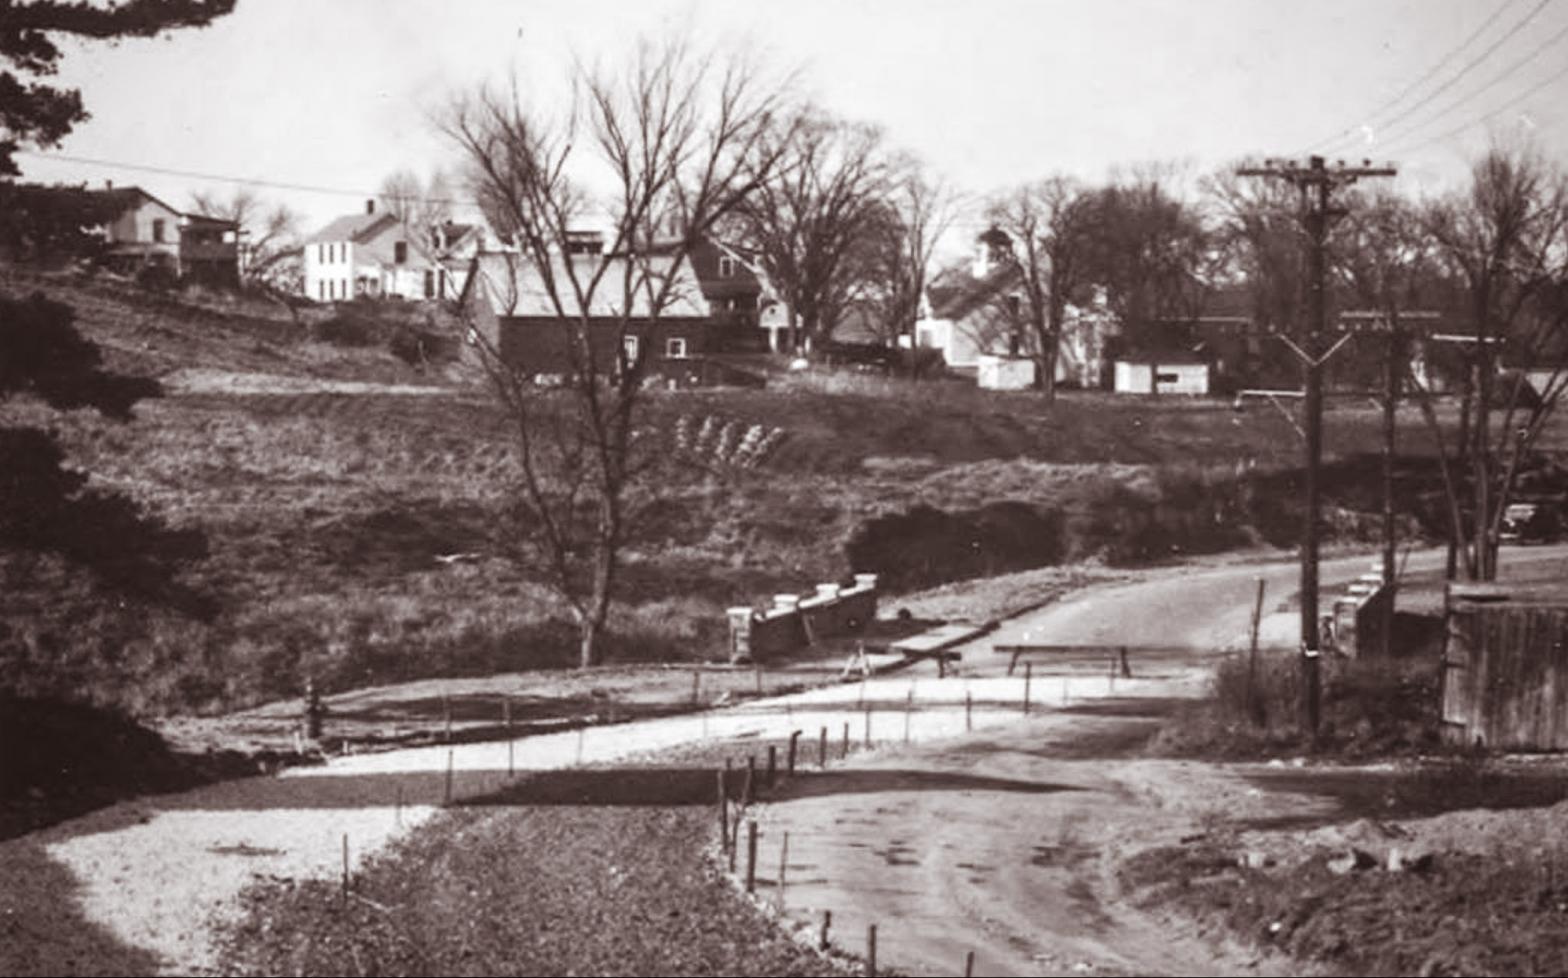 1930s Sepia photograph of Schmanska Barn from Grove Street